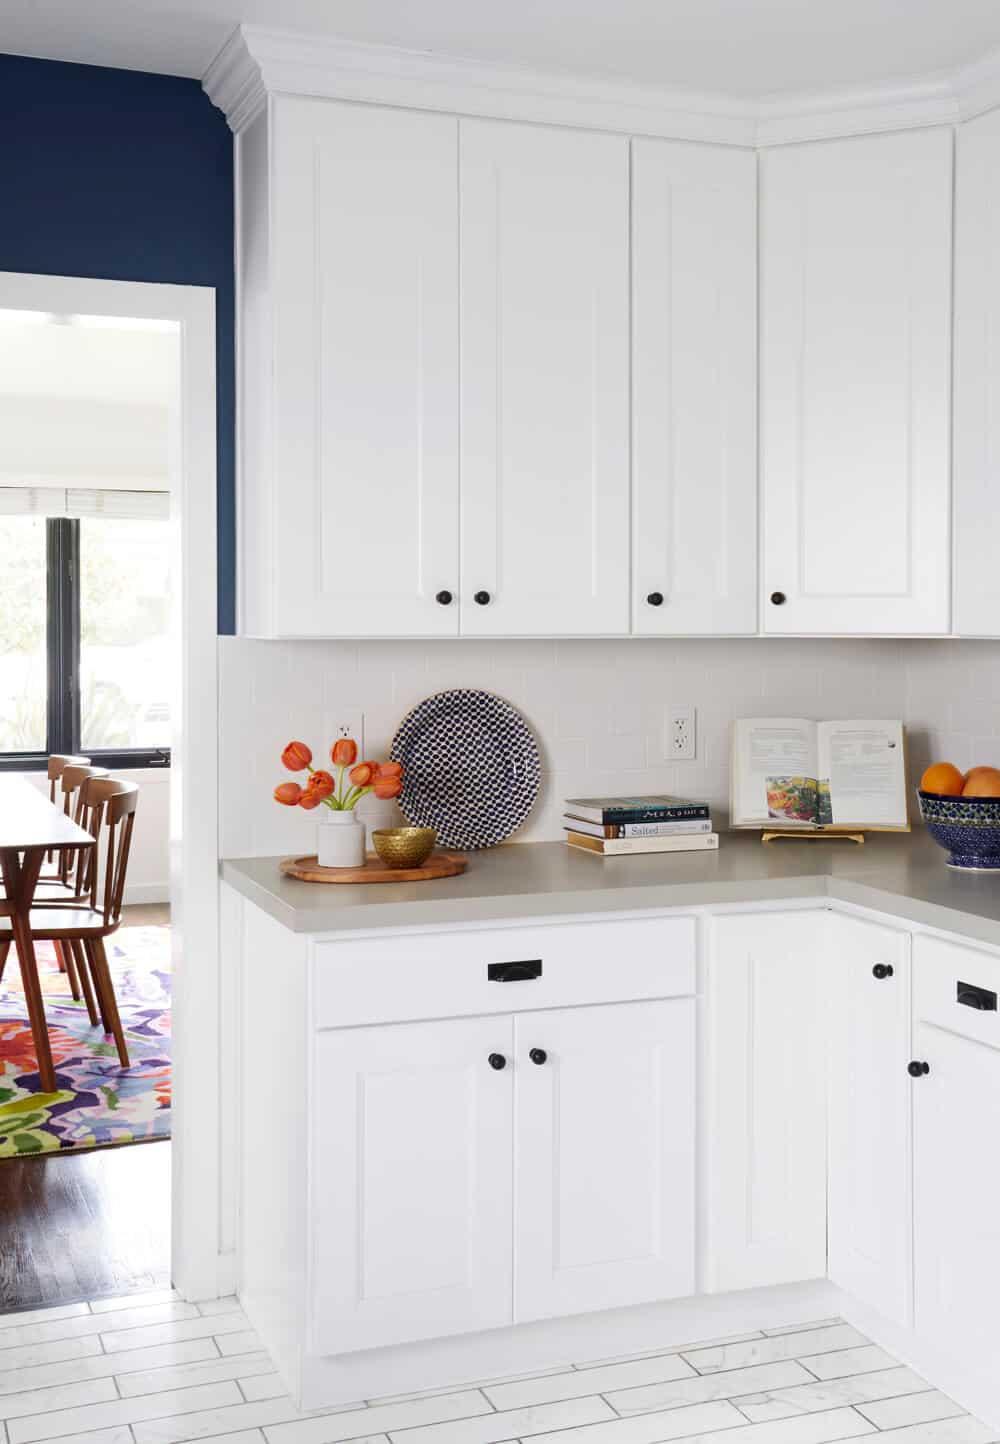 Sarah Strabuel Kitchen Redesign Emily Henderson Design Home Makeover_3_001